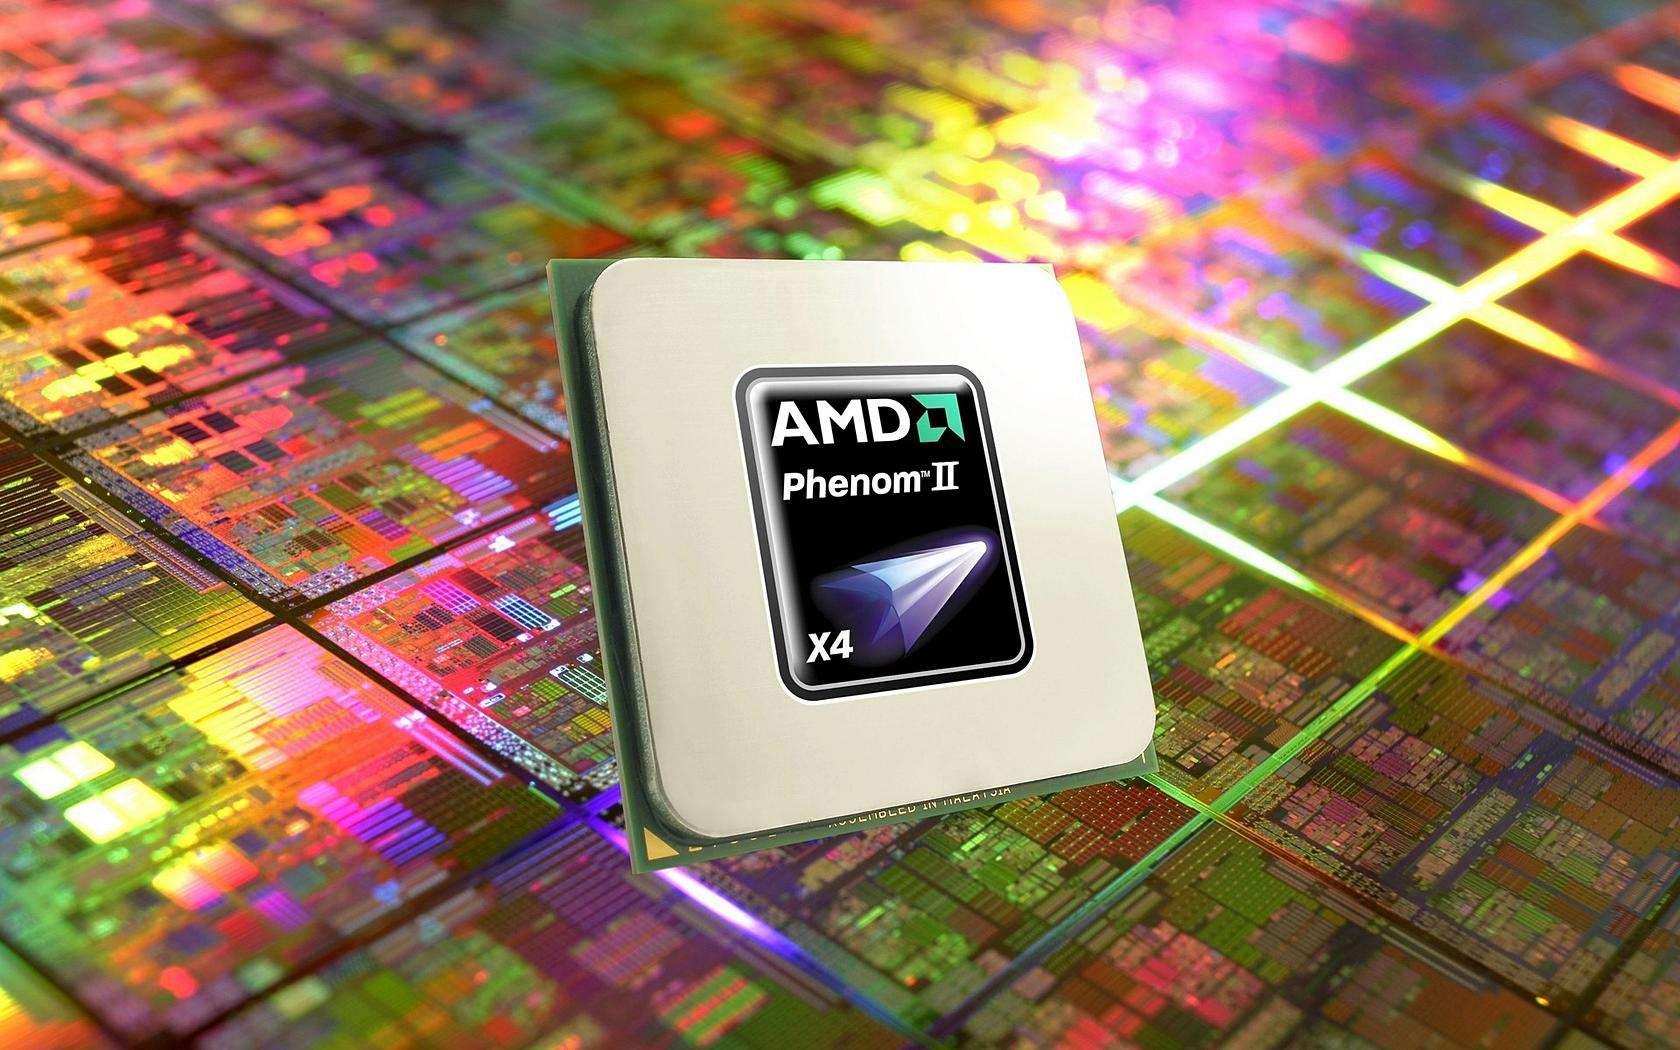 AMD 6核 8核 皓龙4386 4280CPU 六核 八核C32接口 吃鸡性价比高